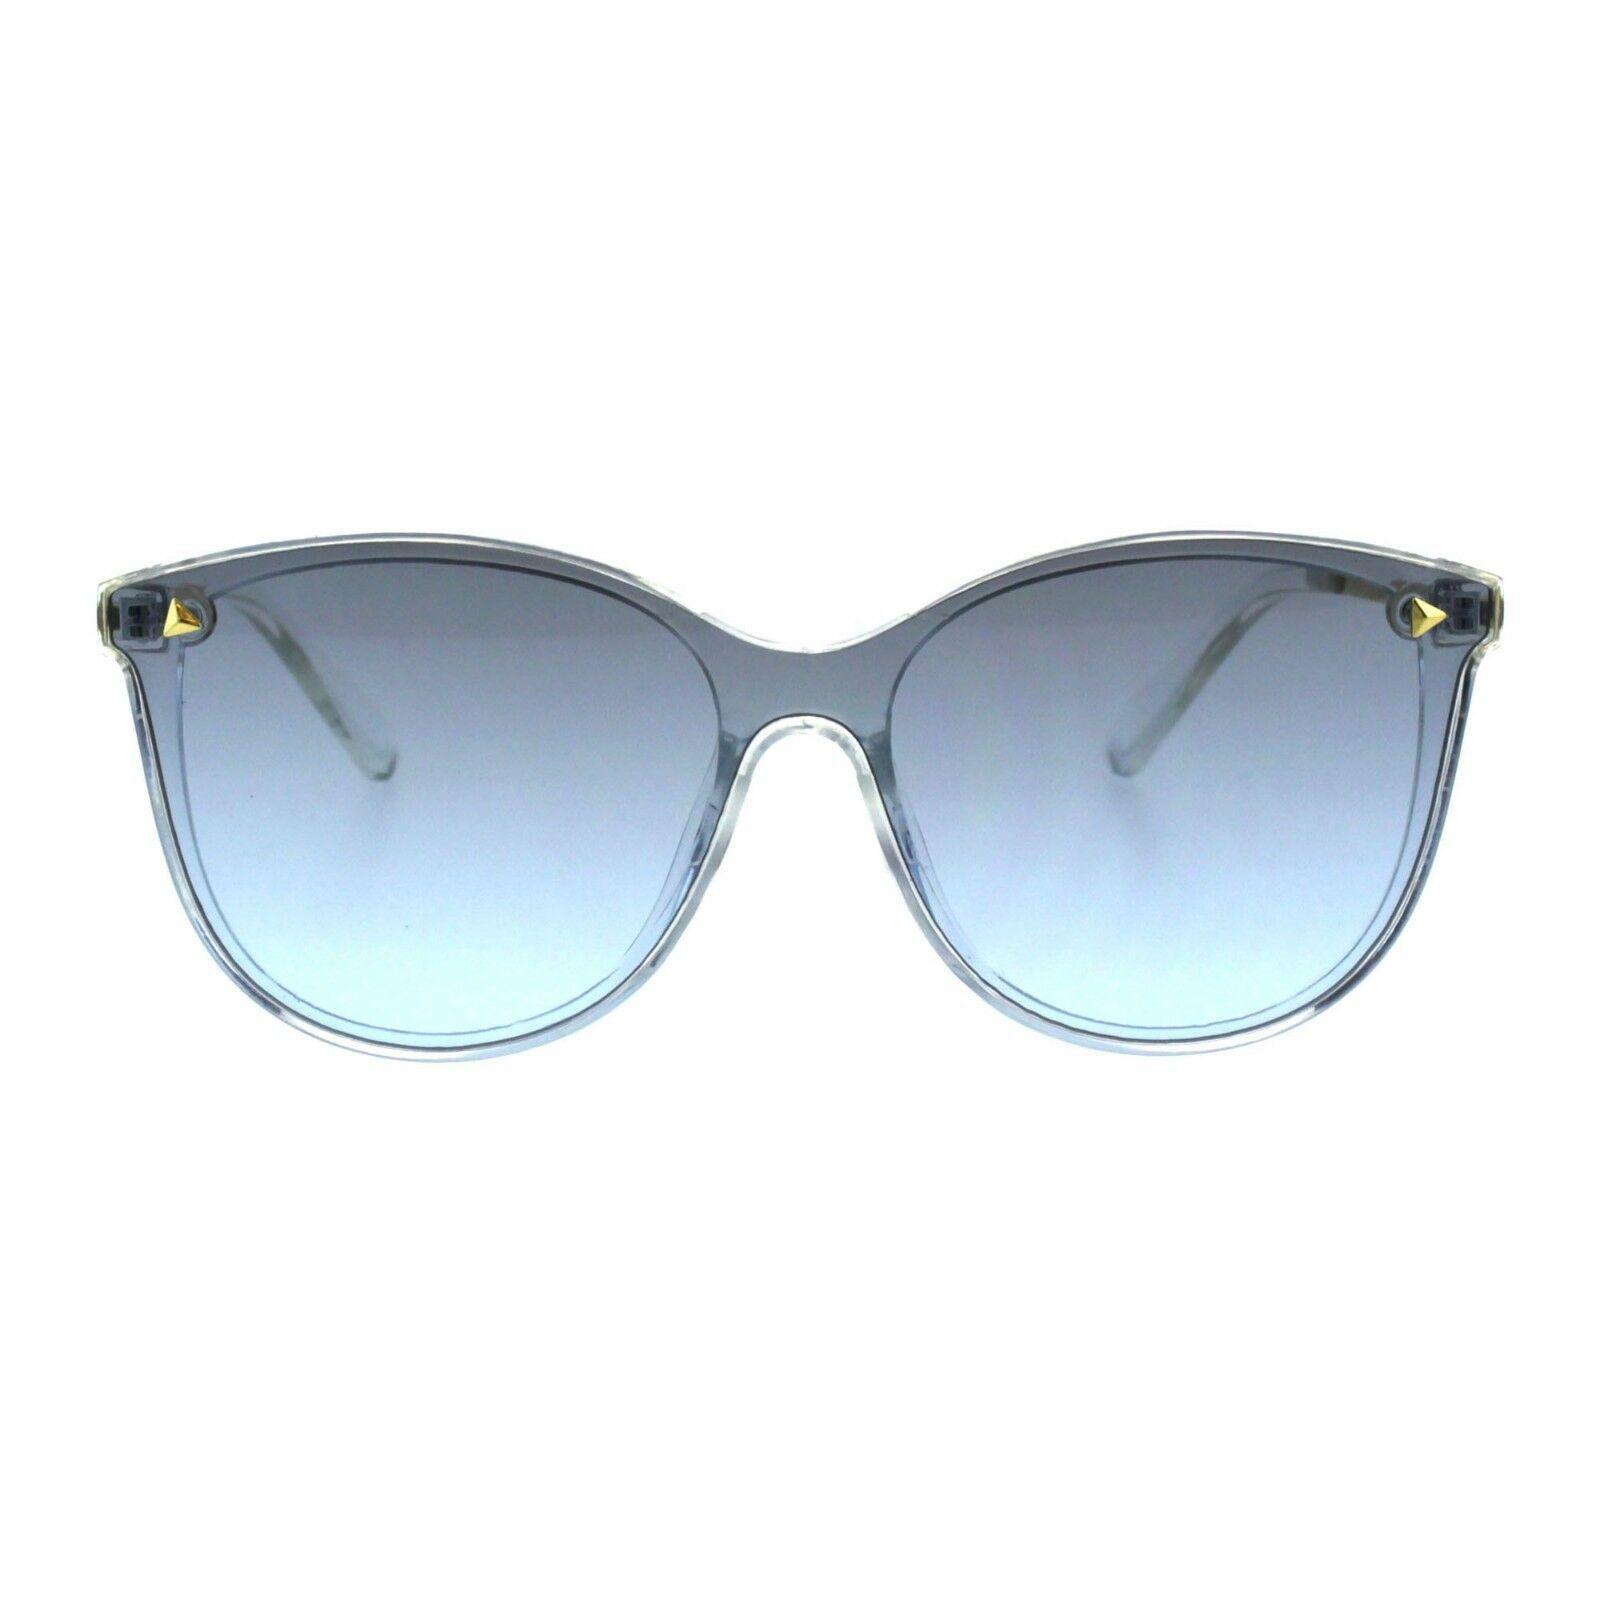 Womens Fashion Sunglasses Cute Stylish Ombre Color Lens UV 400